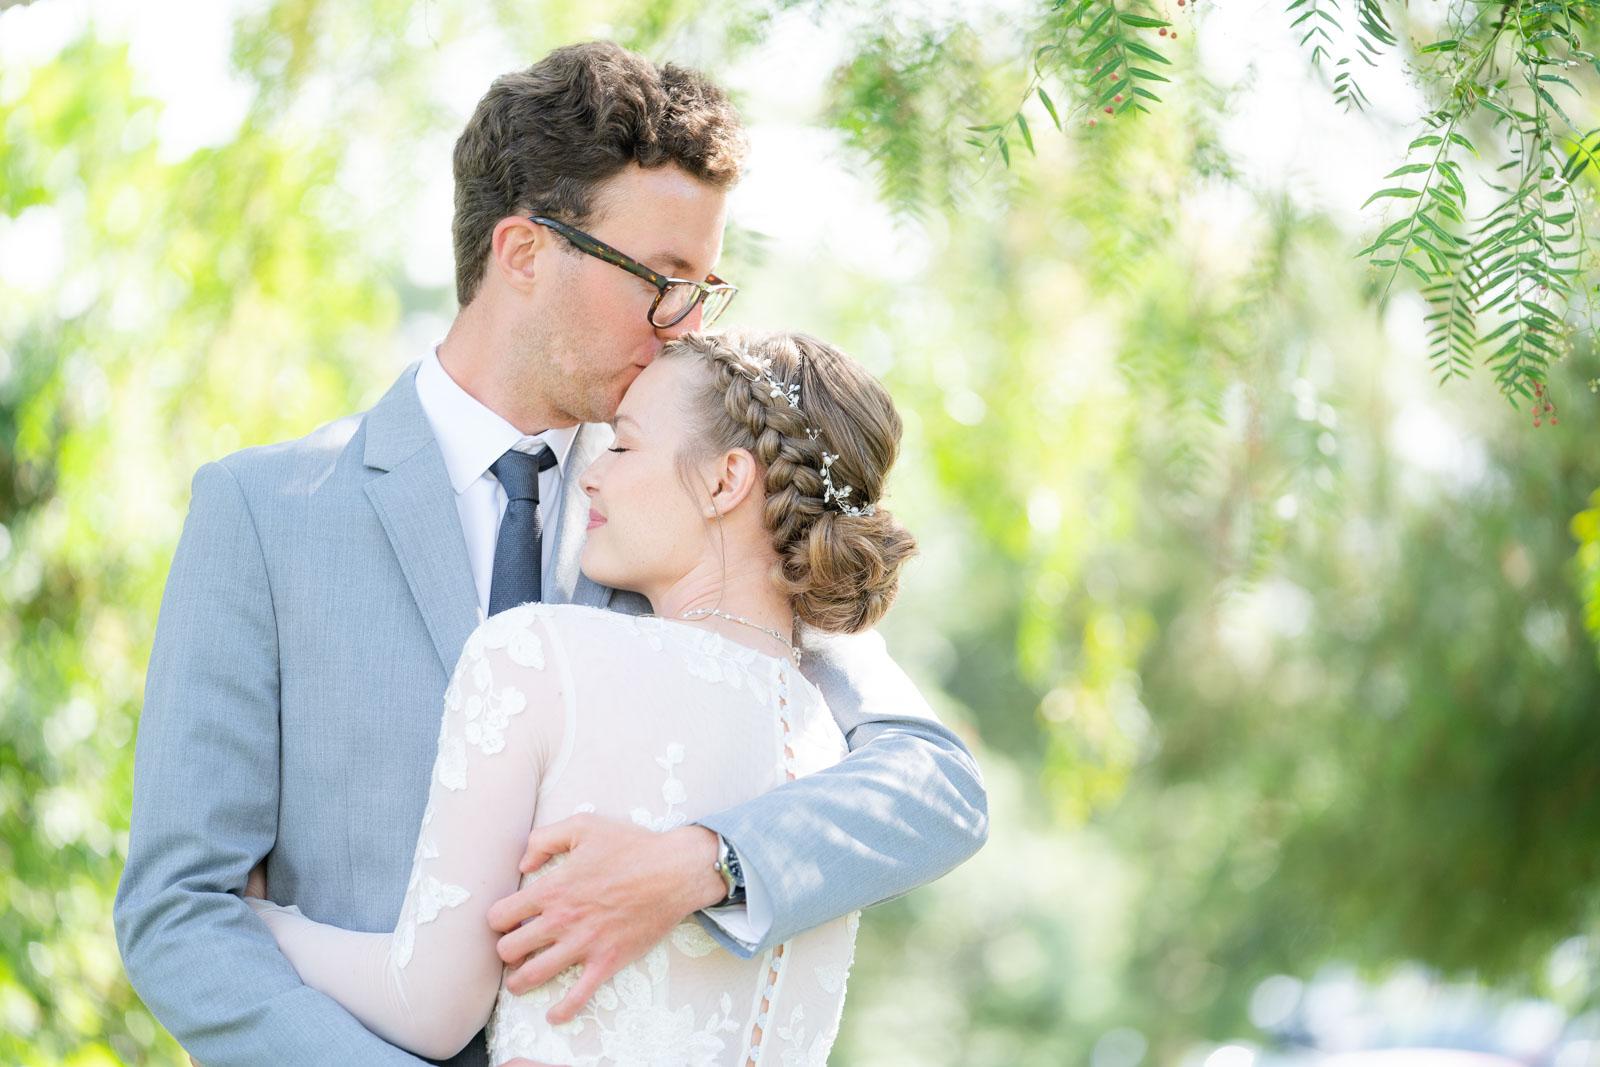 groom kissing his bride on forehead